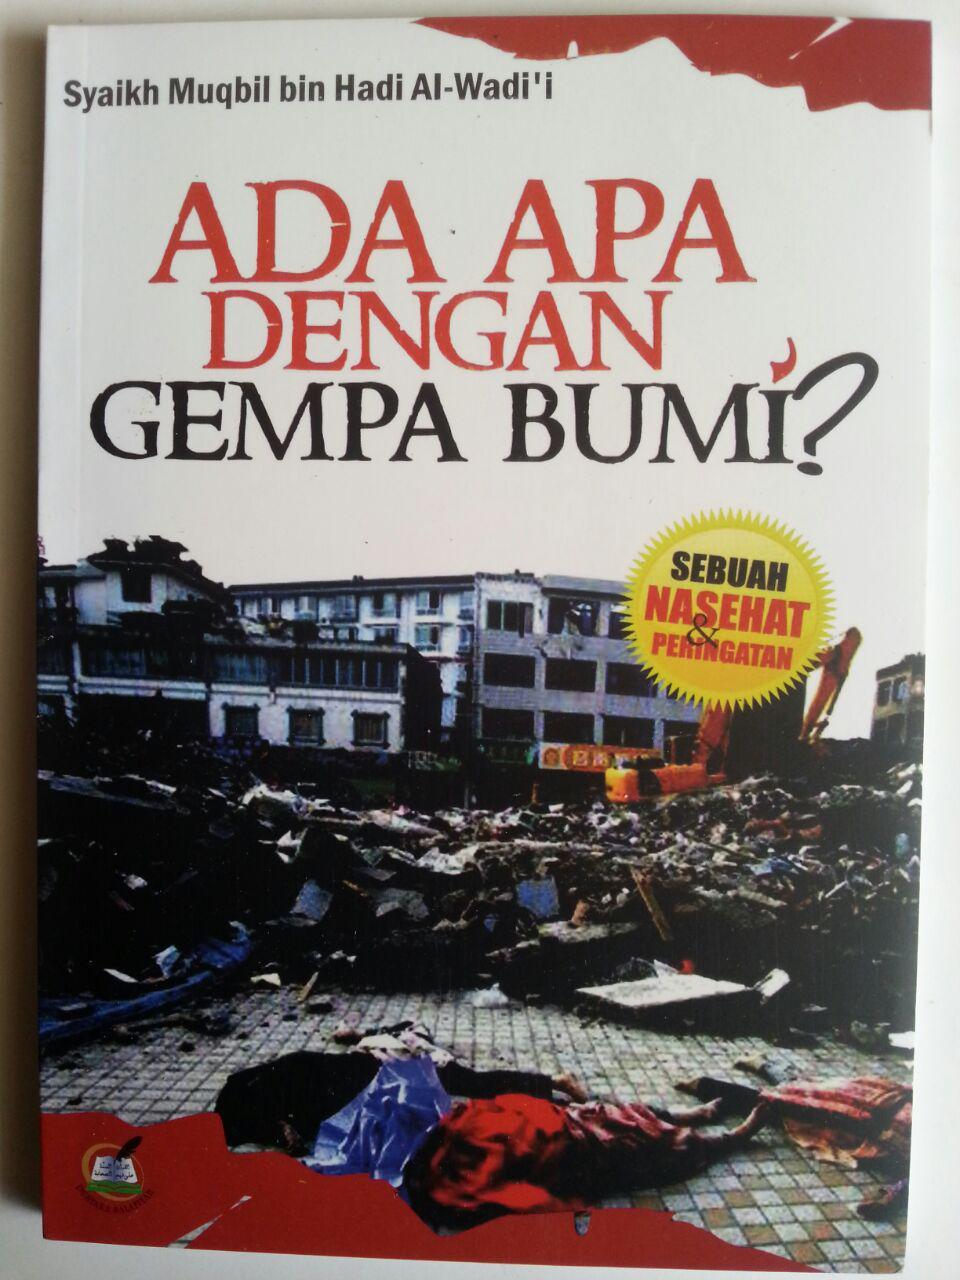 Buku Ada Apa Dengan Gempa Bumi Sebuah Nasehat Peringatan cover 2